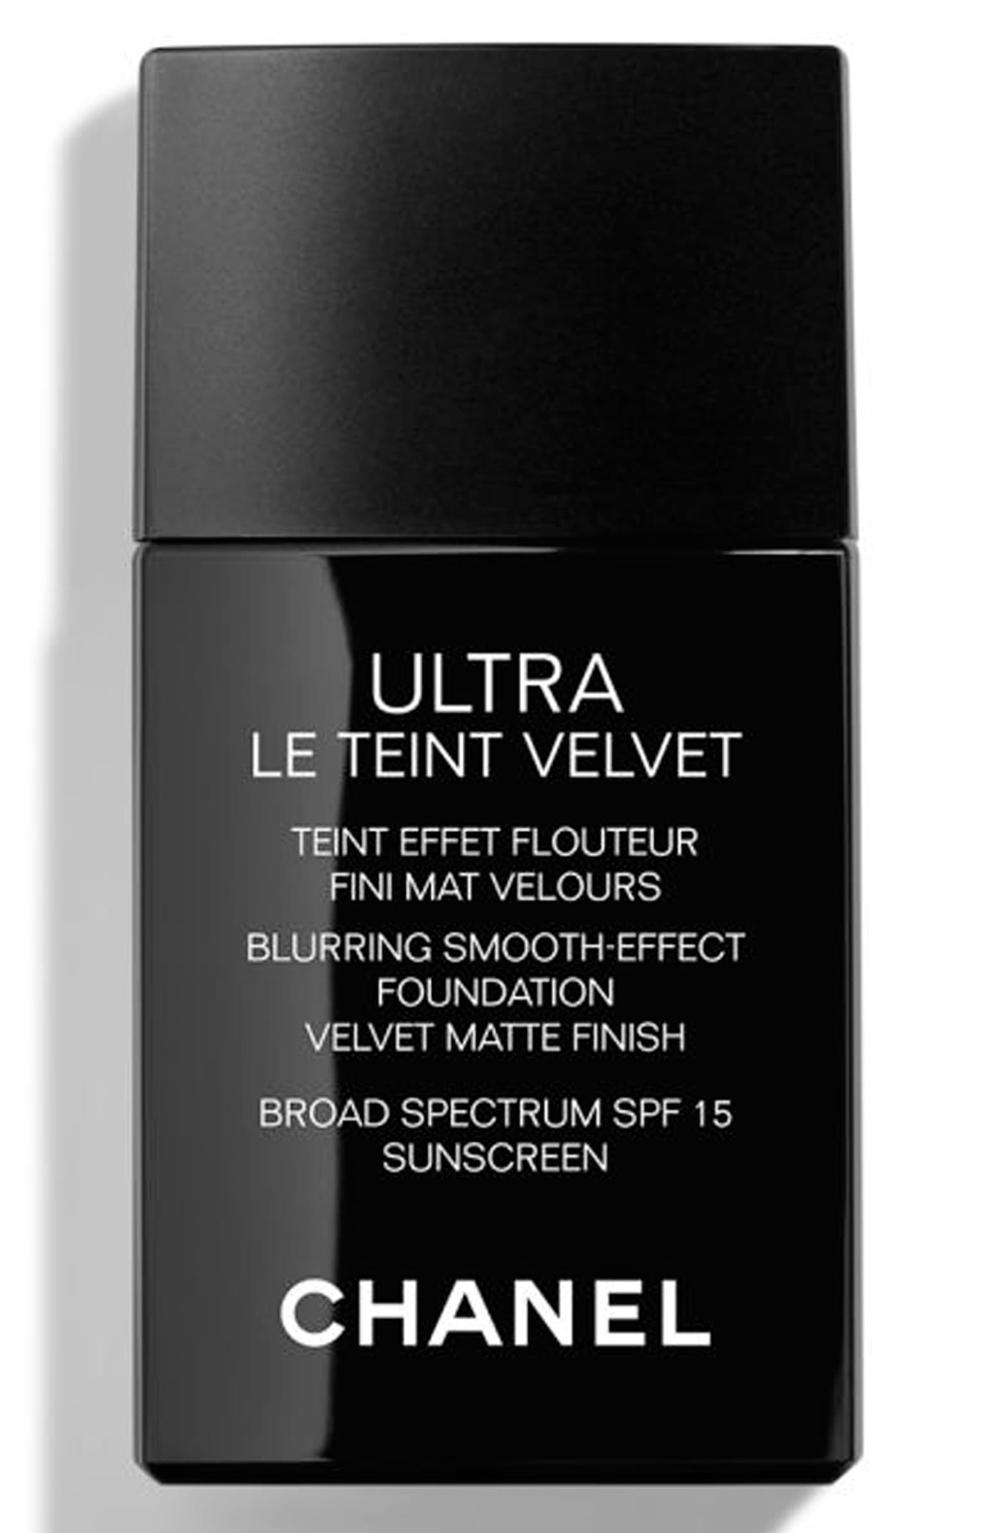 CHANEL ULTRA LE TEINT Velvet Blurring SmoothEffect